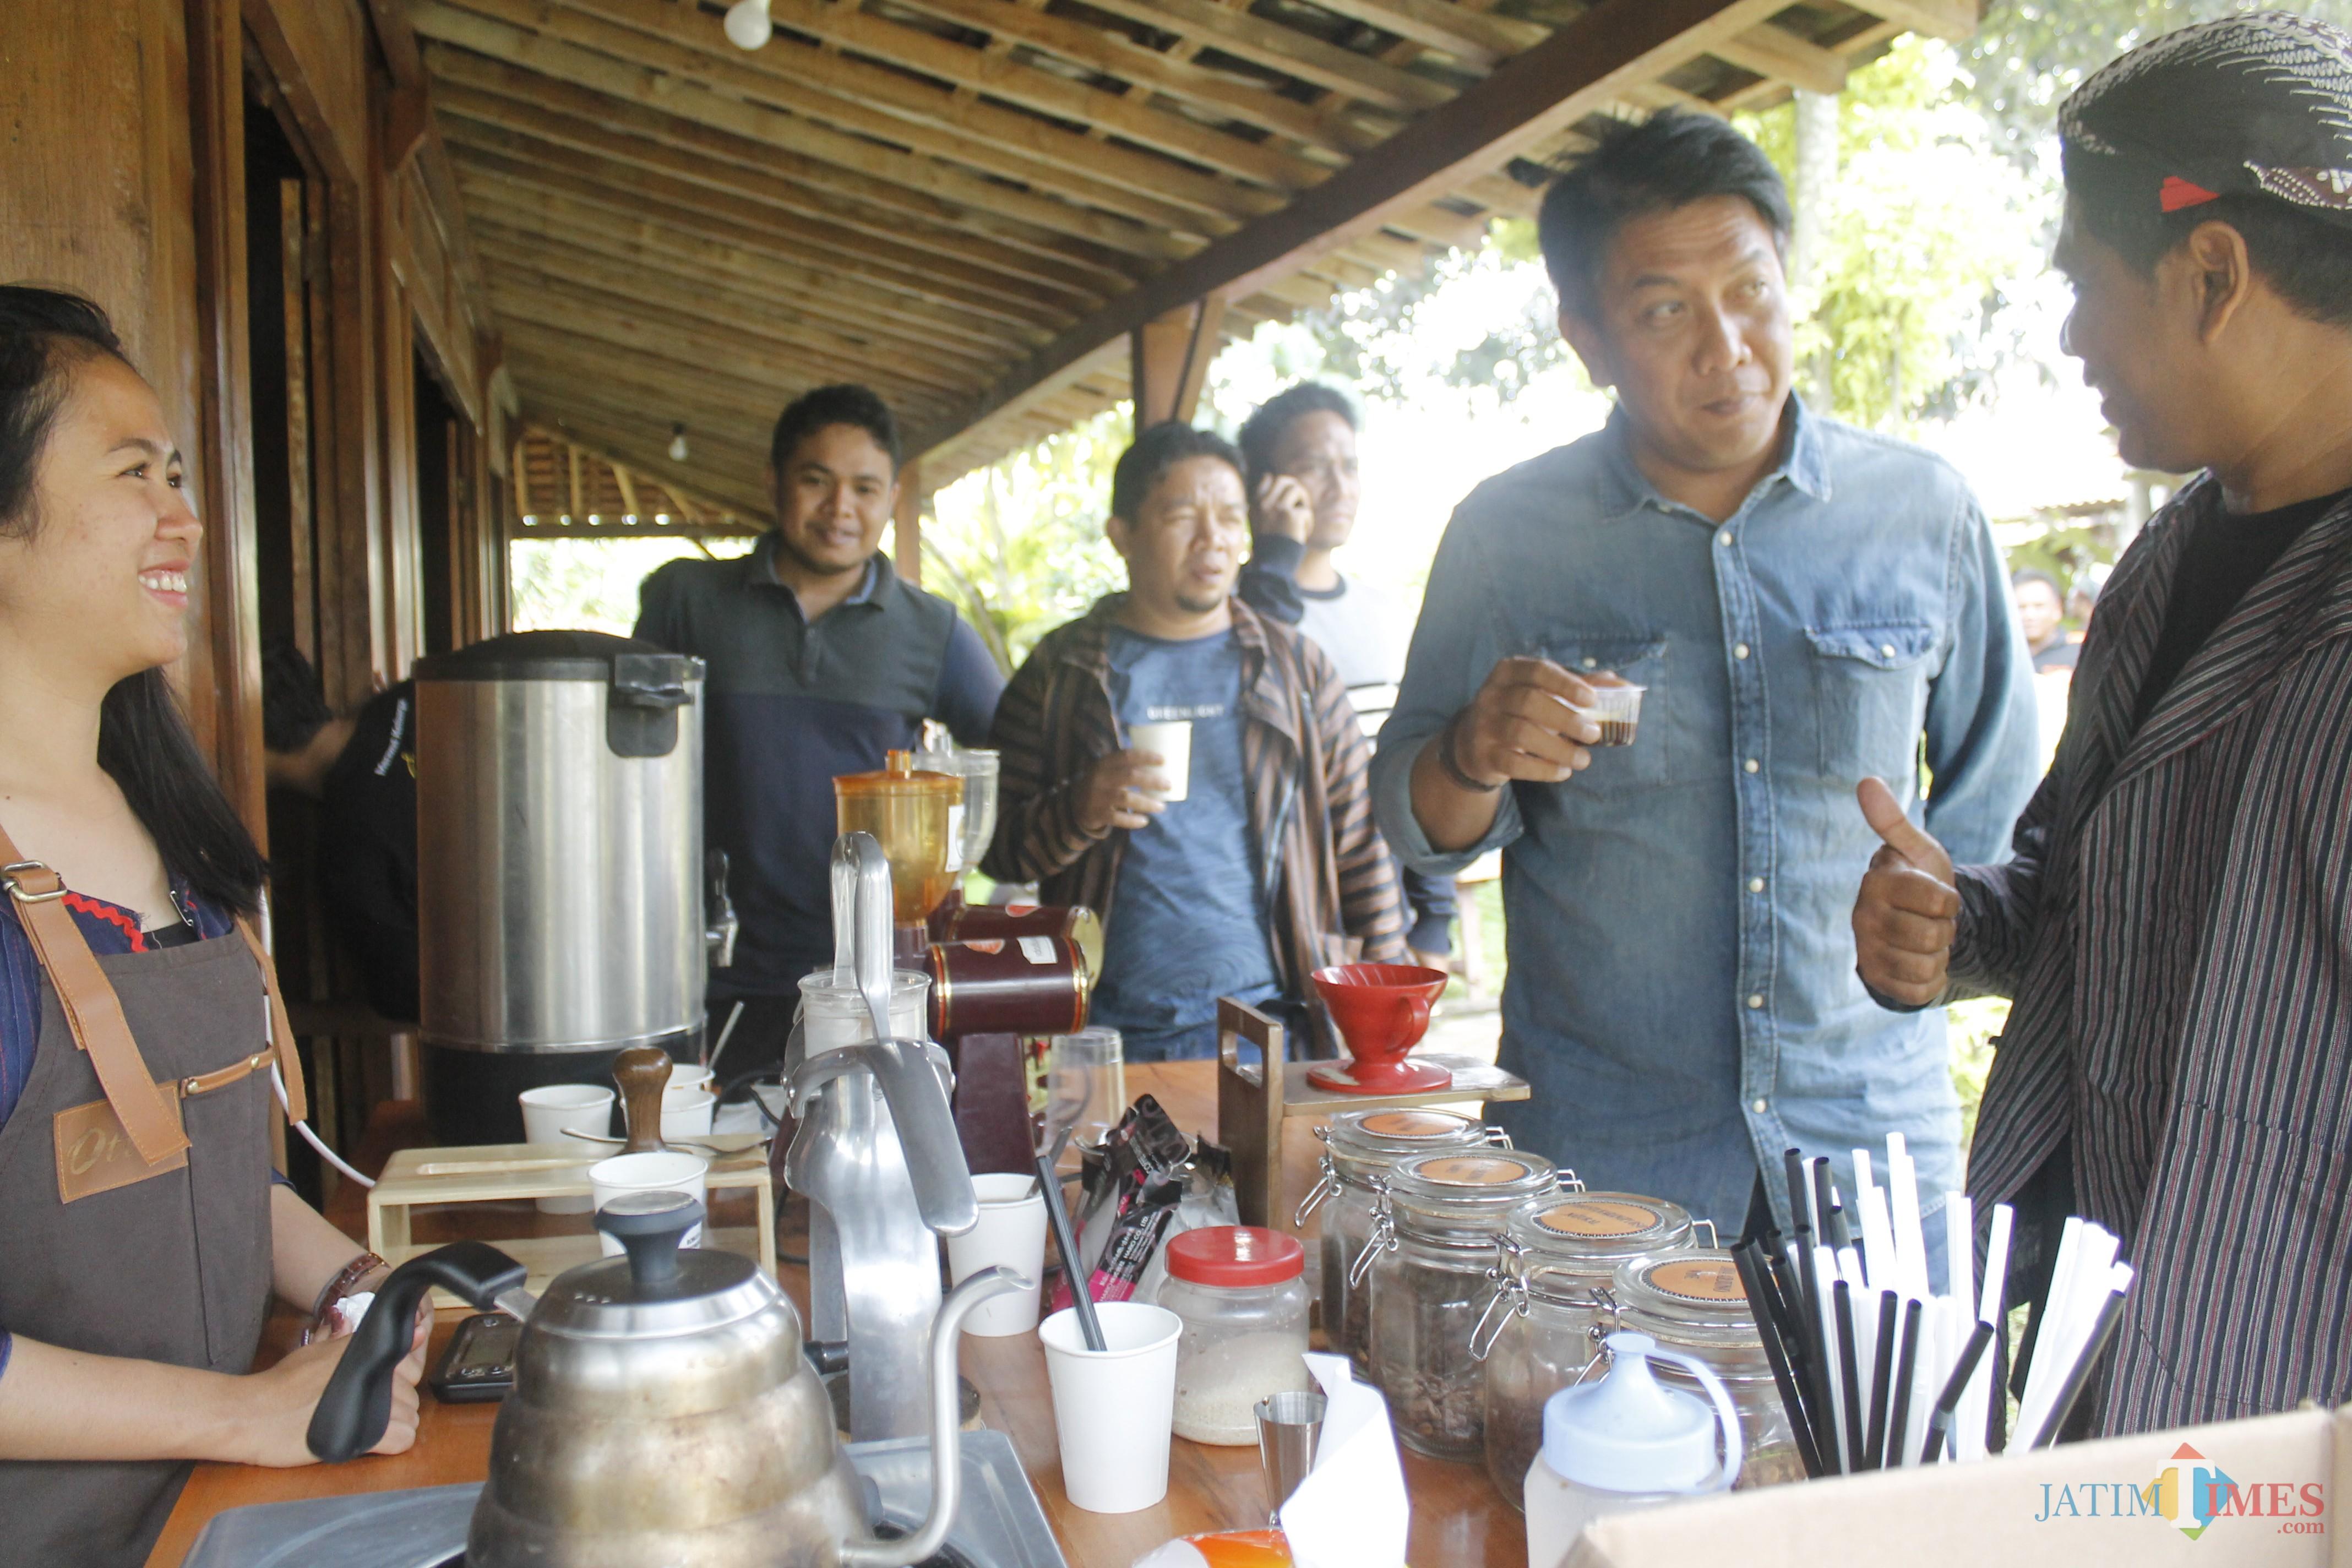 Kepala Dinas Kebudayaan dan Pariwisata (Disbudpar) Made Arya Wedhantara saat mencicipi kopi khas Malang di Van Java.